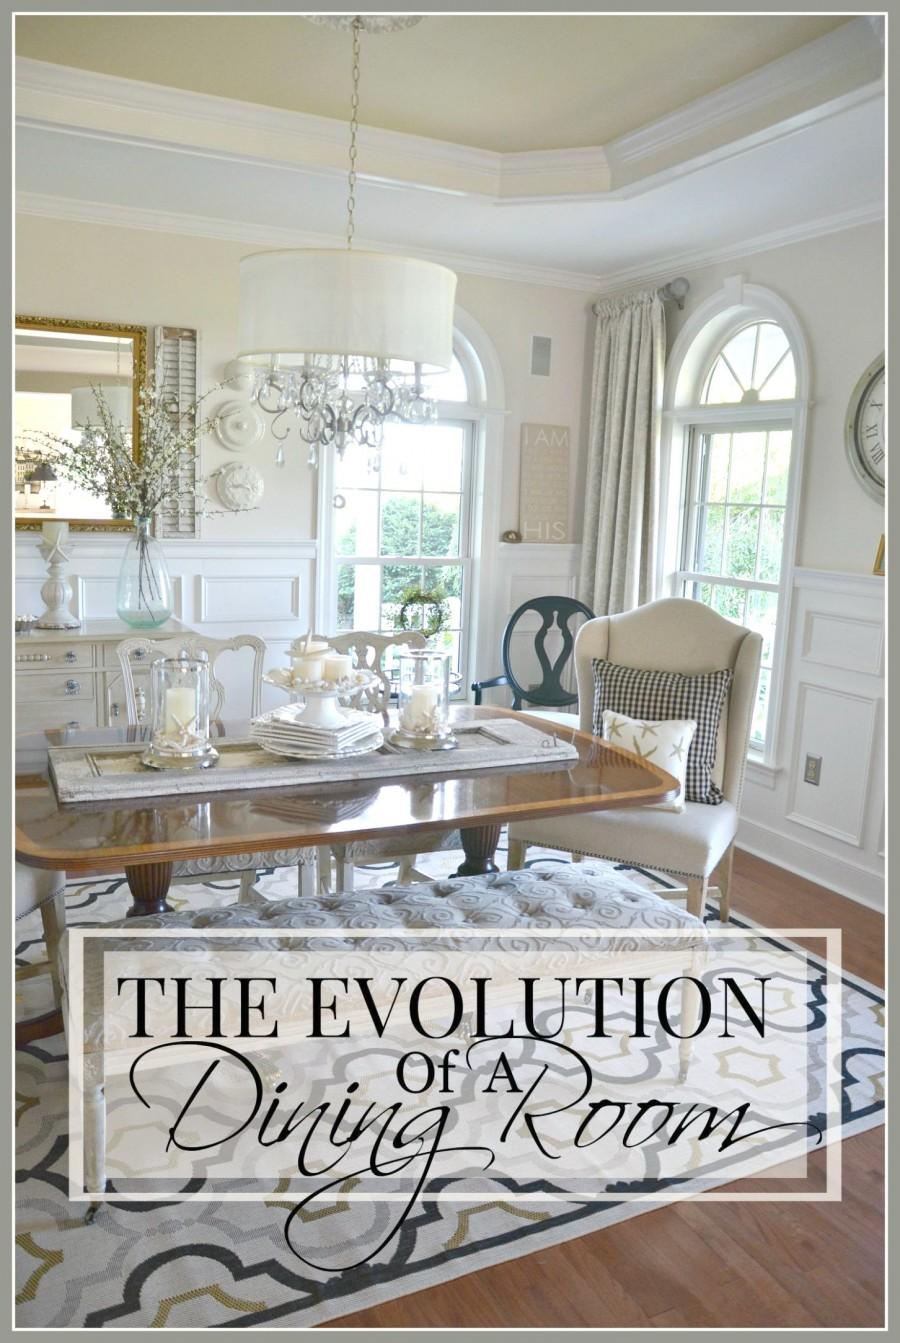 EVOLUTION OF A DINING ROOM- From gut to makeover-stonegableblog.com